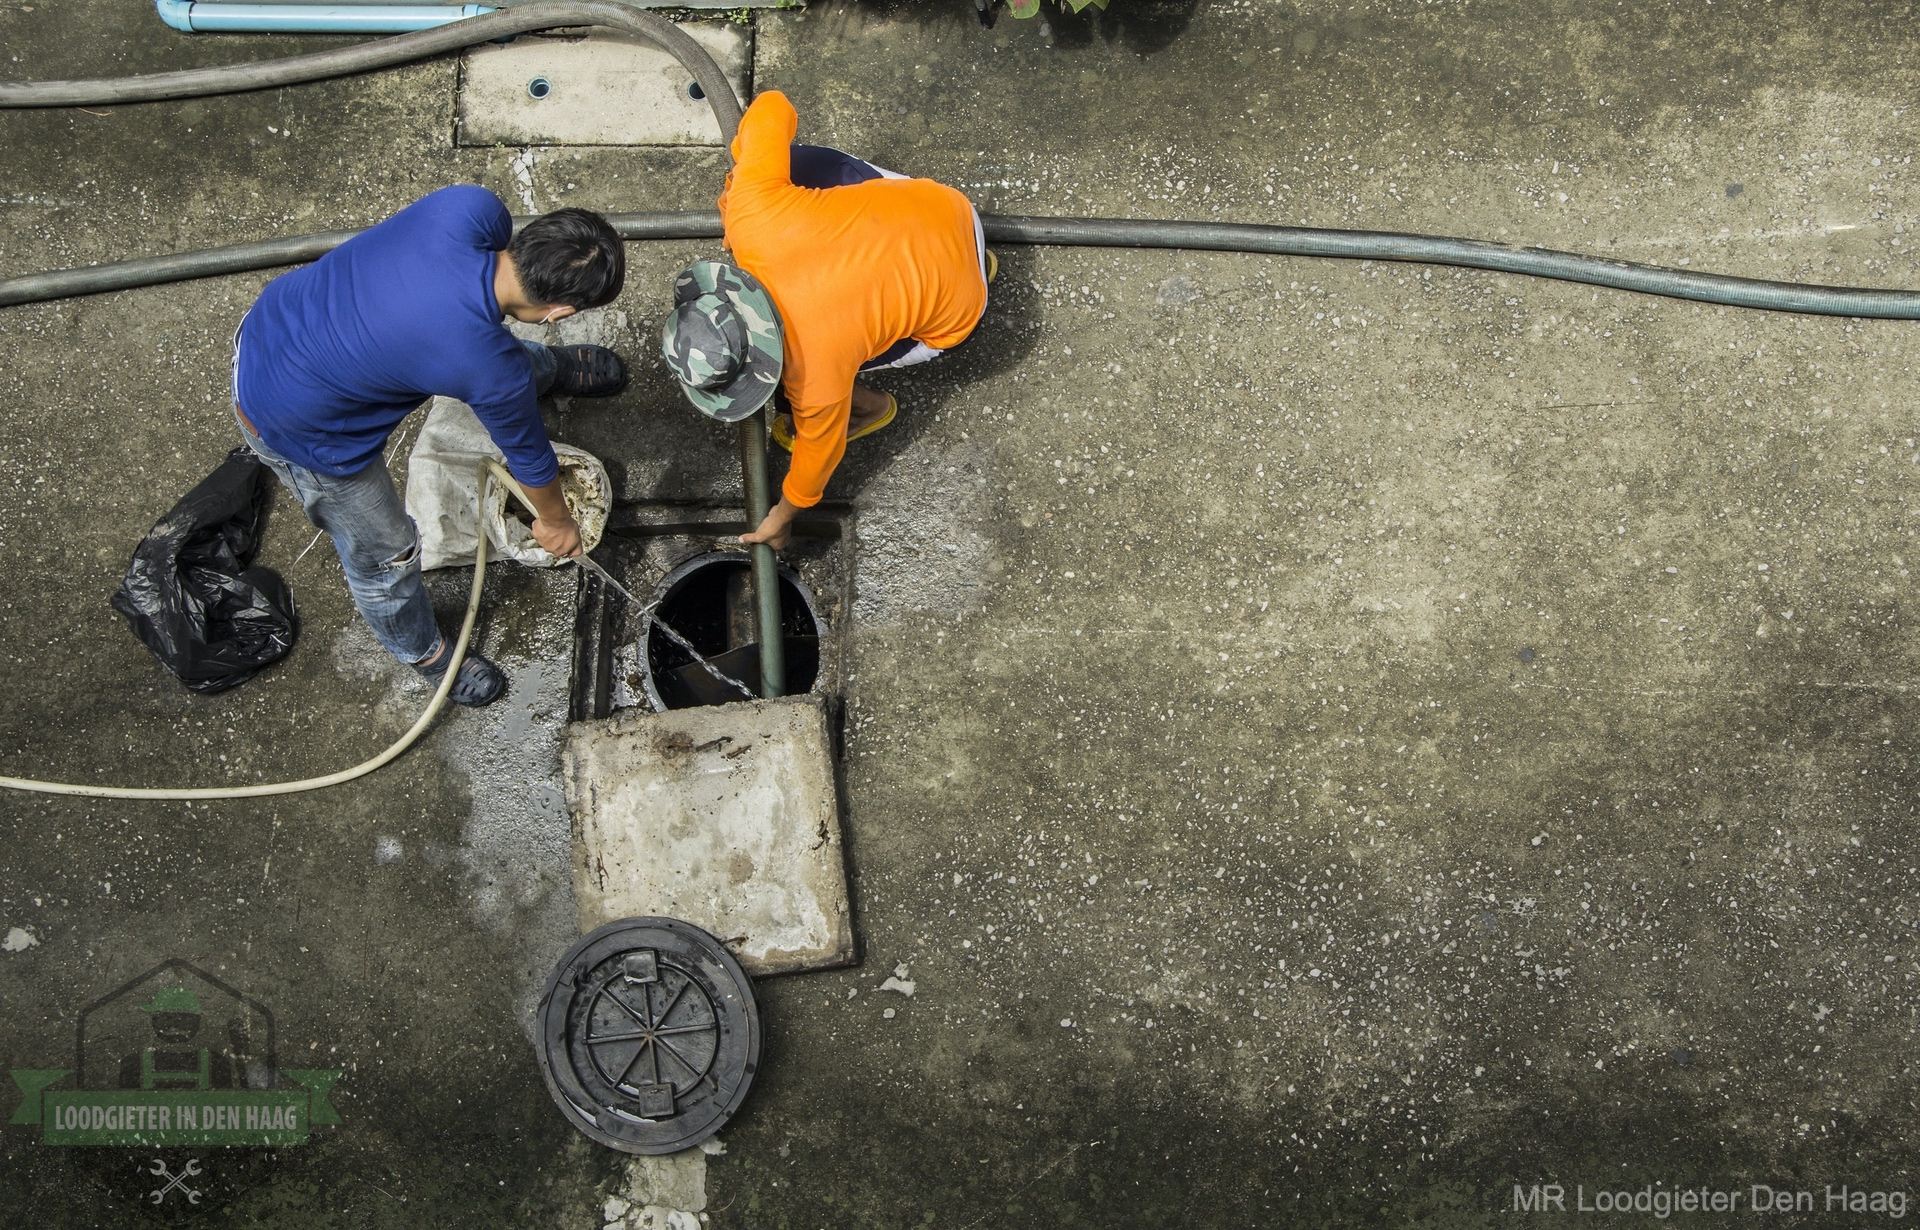 Riool inspectie loodgieter denhaag